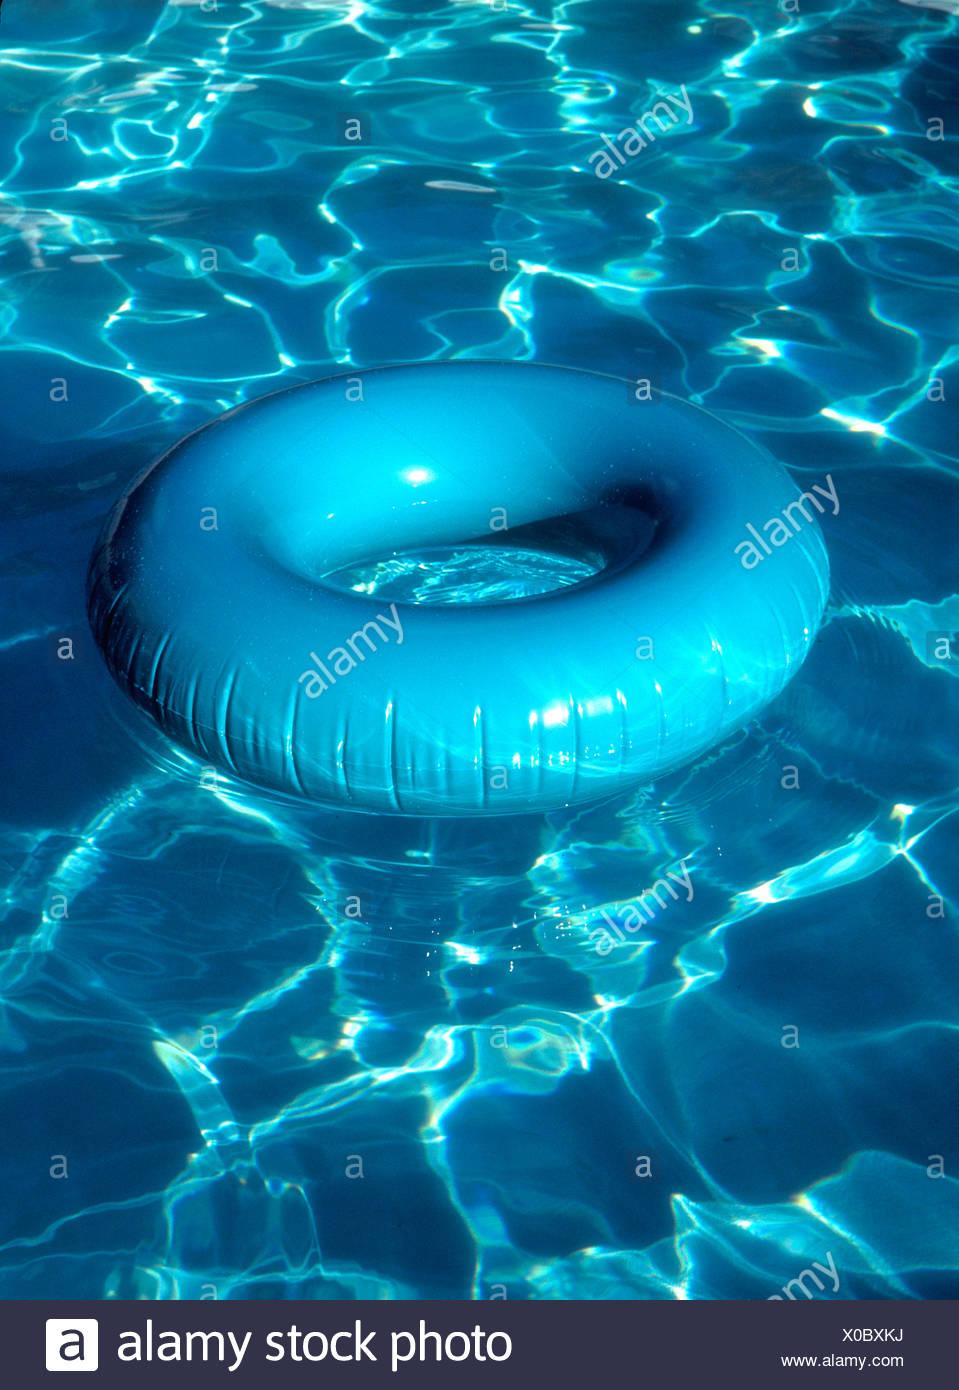 Aqua innertube con piscina reflexiones Imagen De Stock